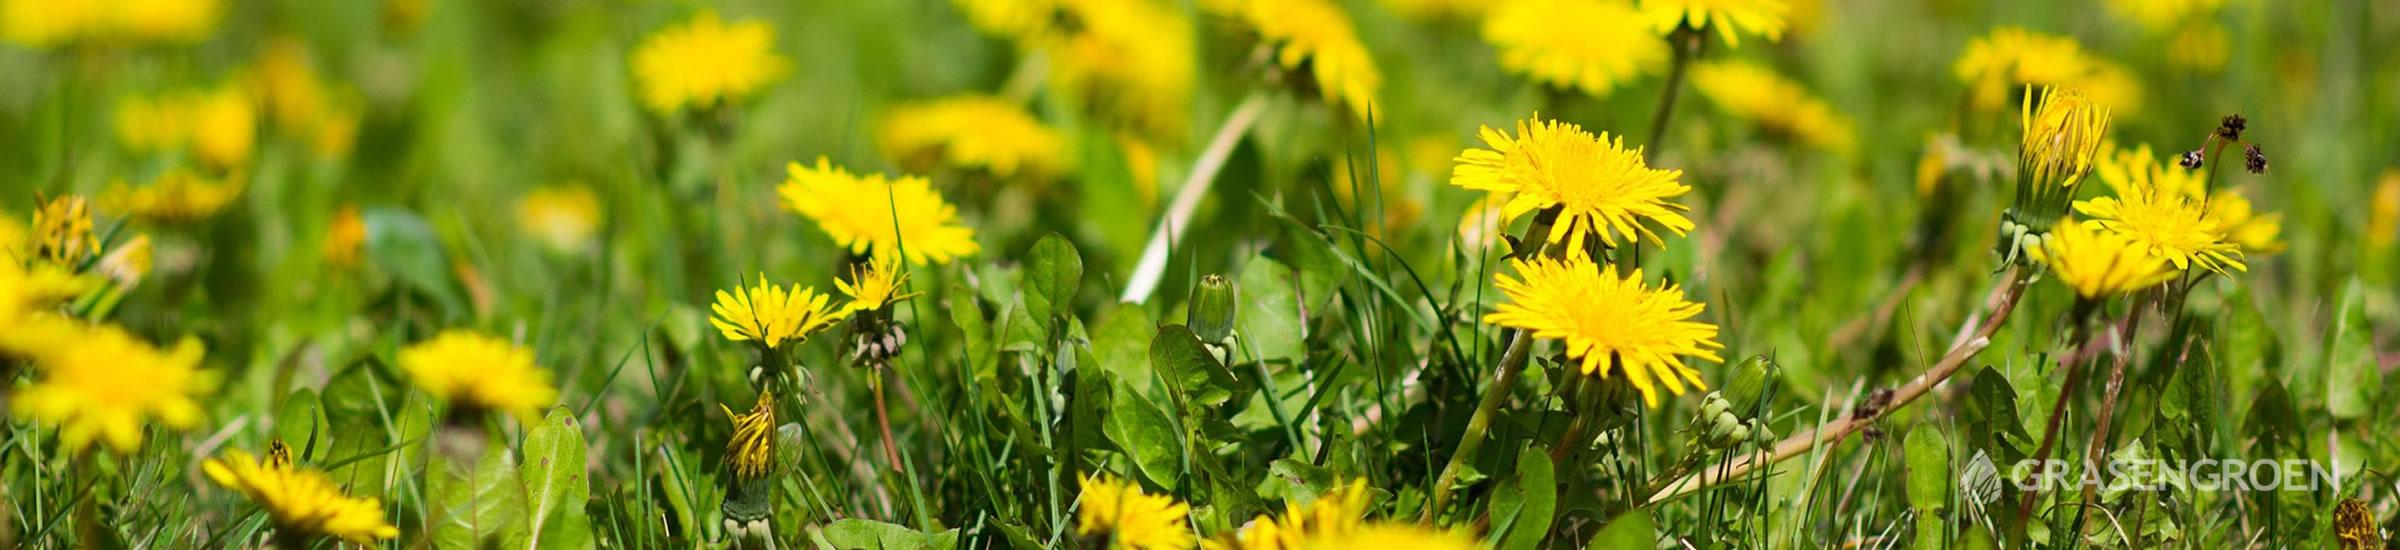 Onkruid • Gras en Groen Winkel